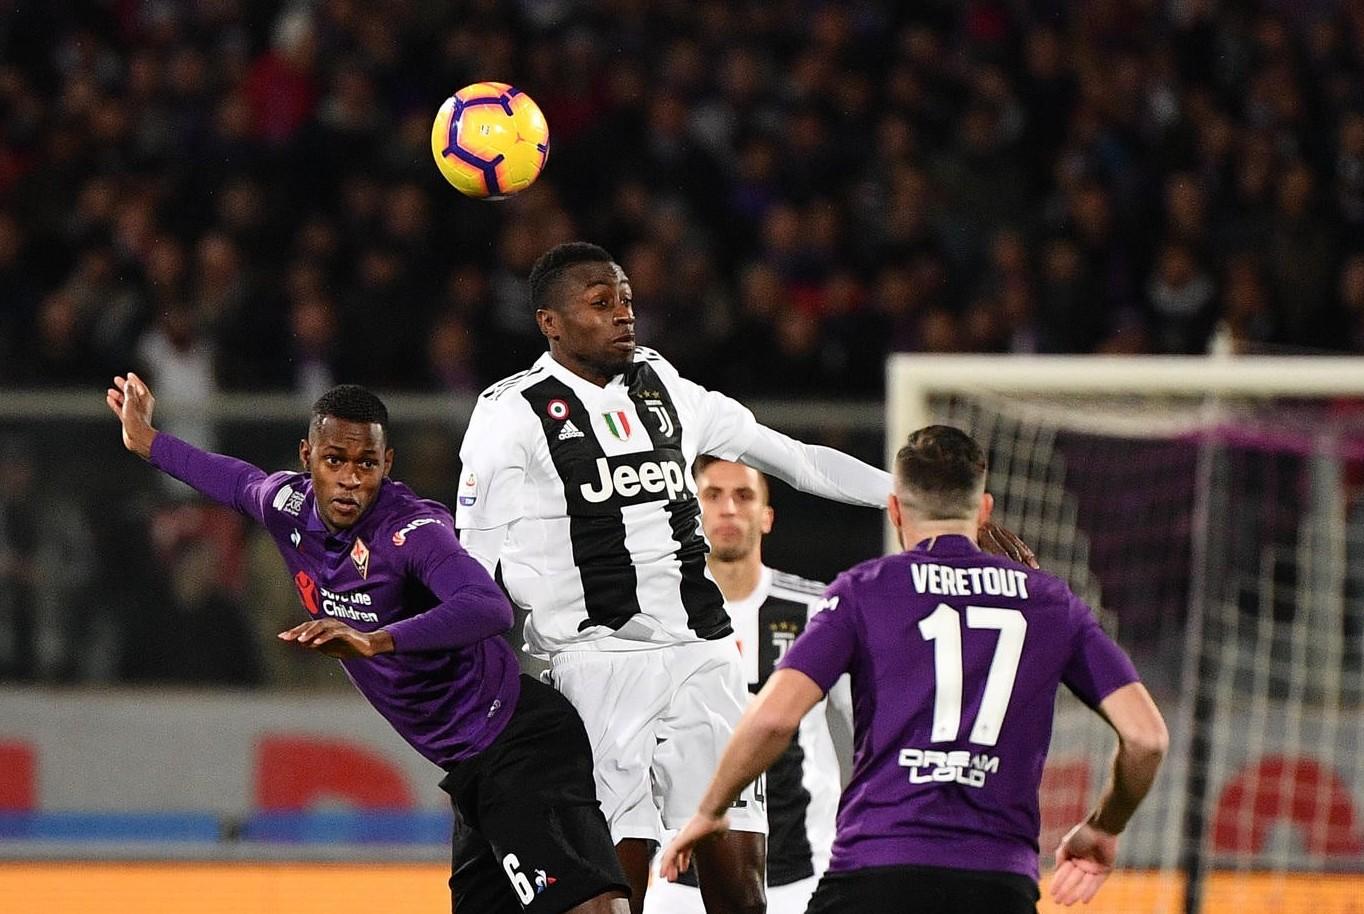 Fiorentina Juventus streaming gratis liv